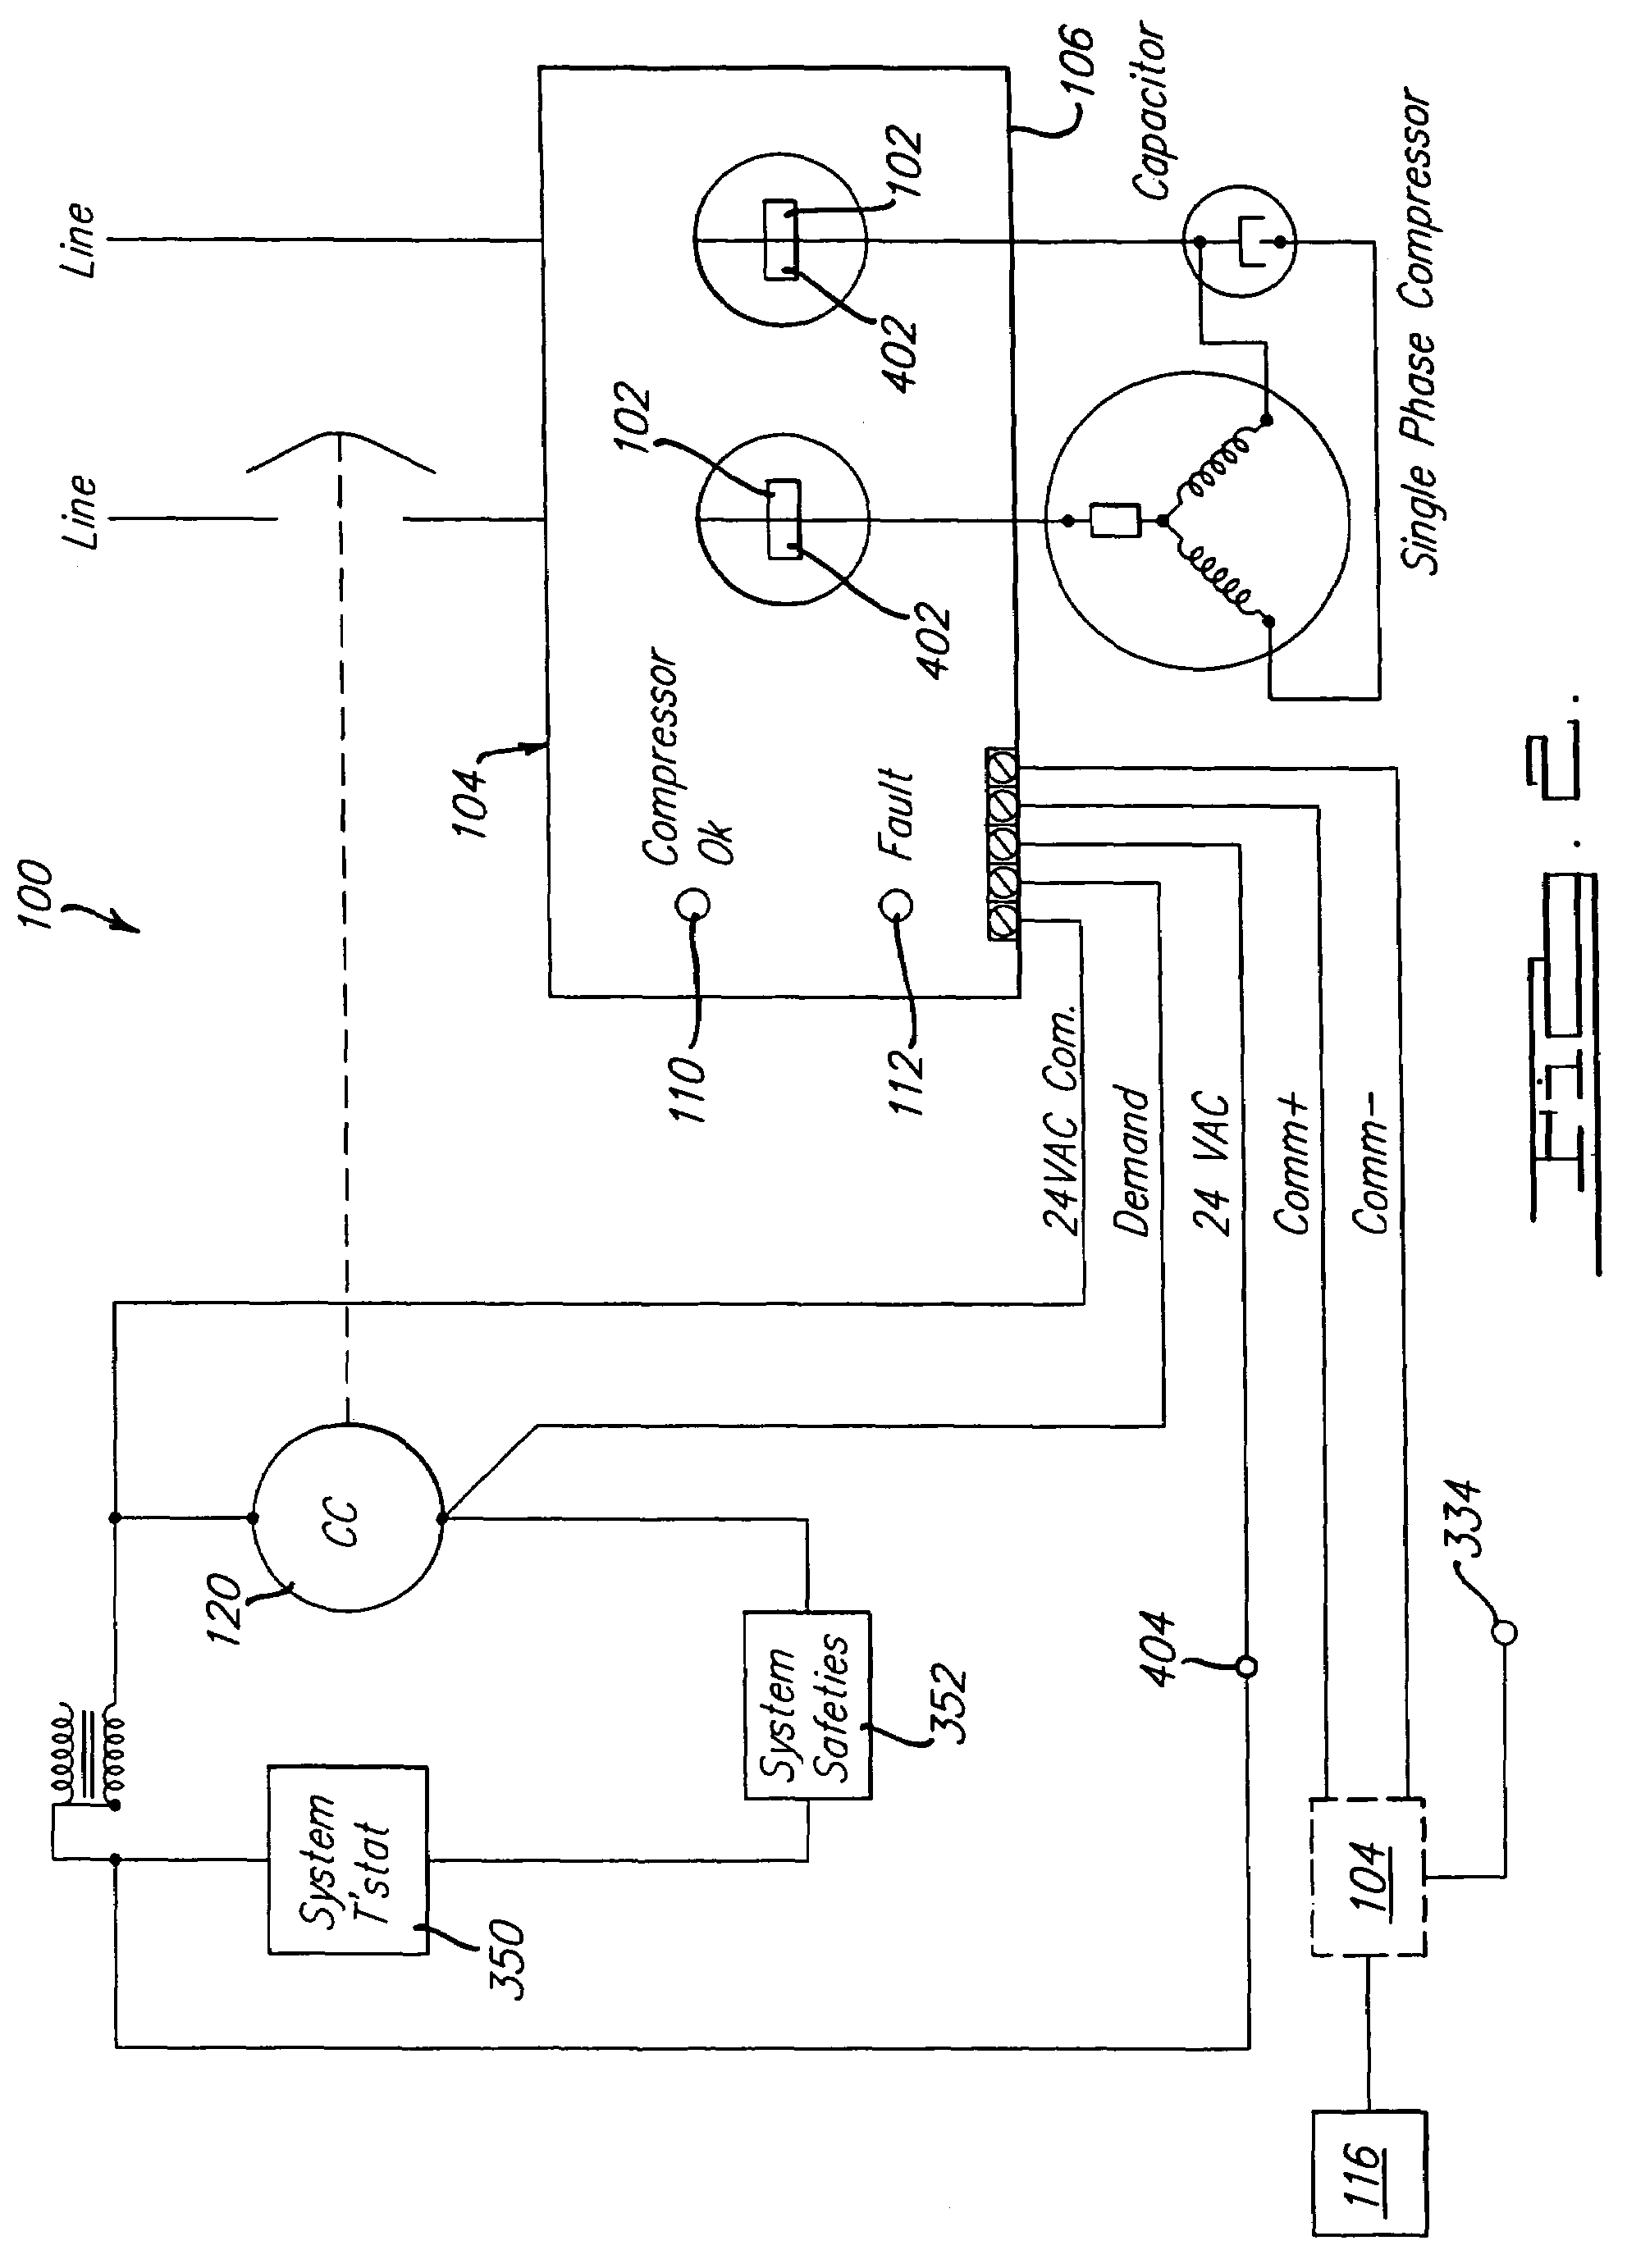 Emerson M200 Wiring Diagram